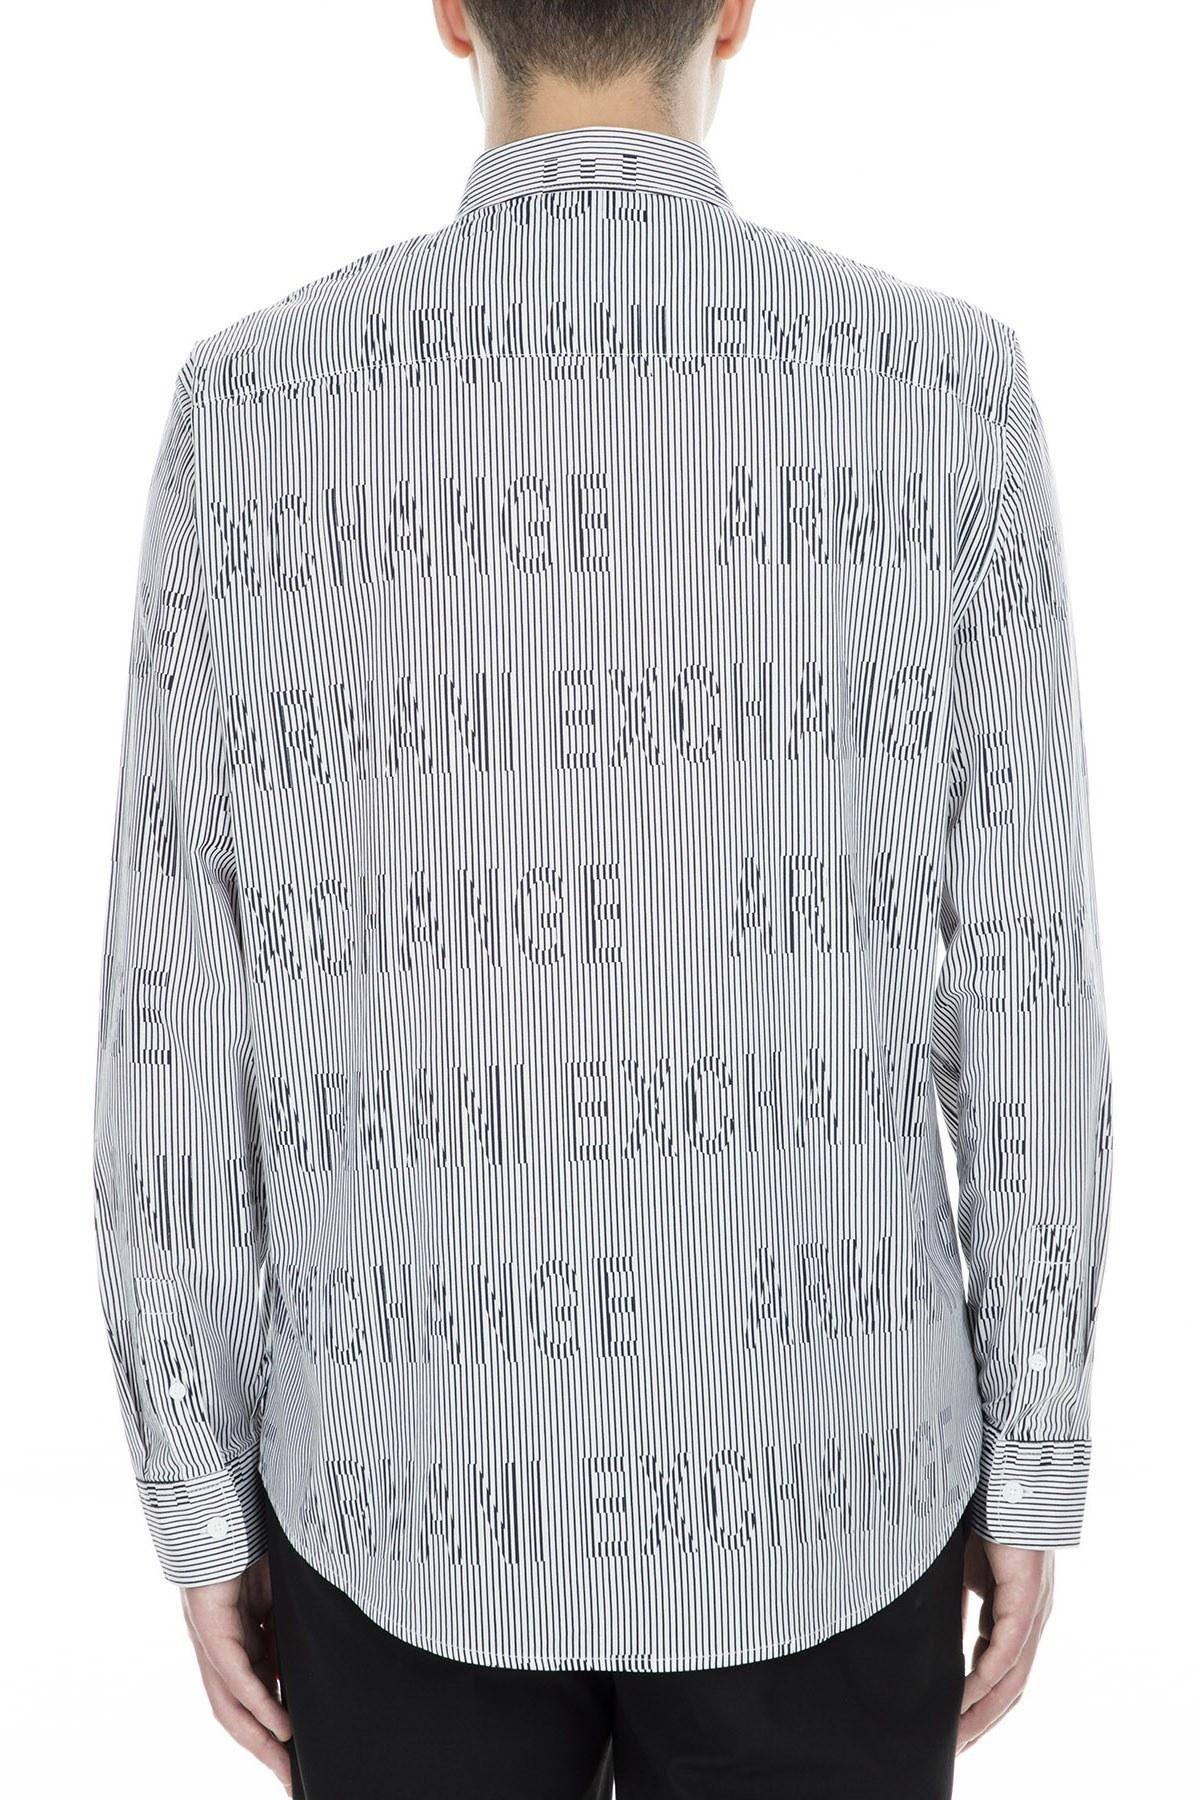 Armani Exchange Erkek Gömlek 3GZC36 ZNEAZ 5130 BEYAZ